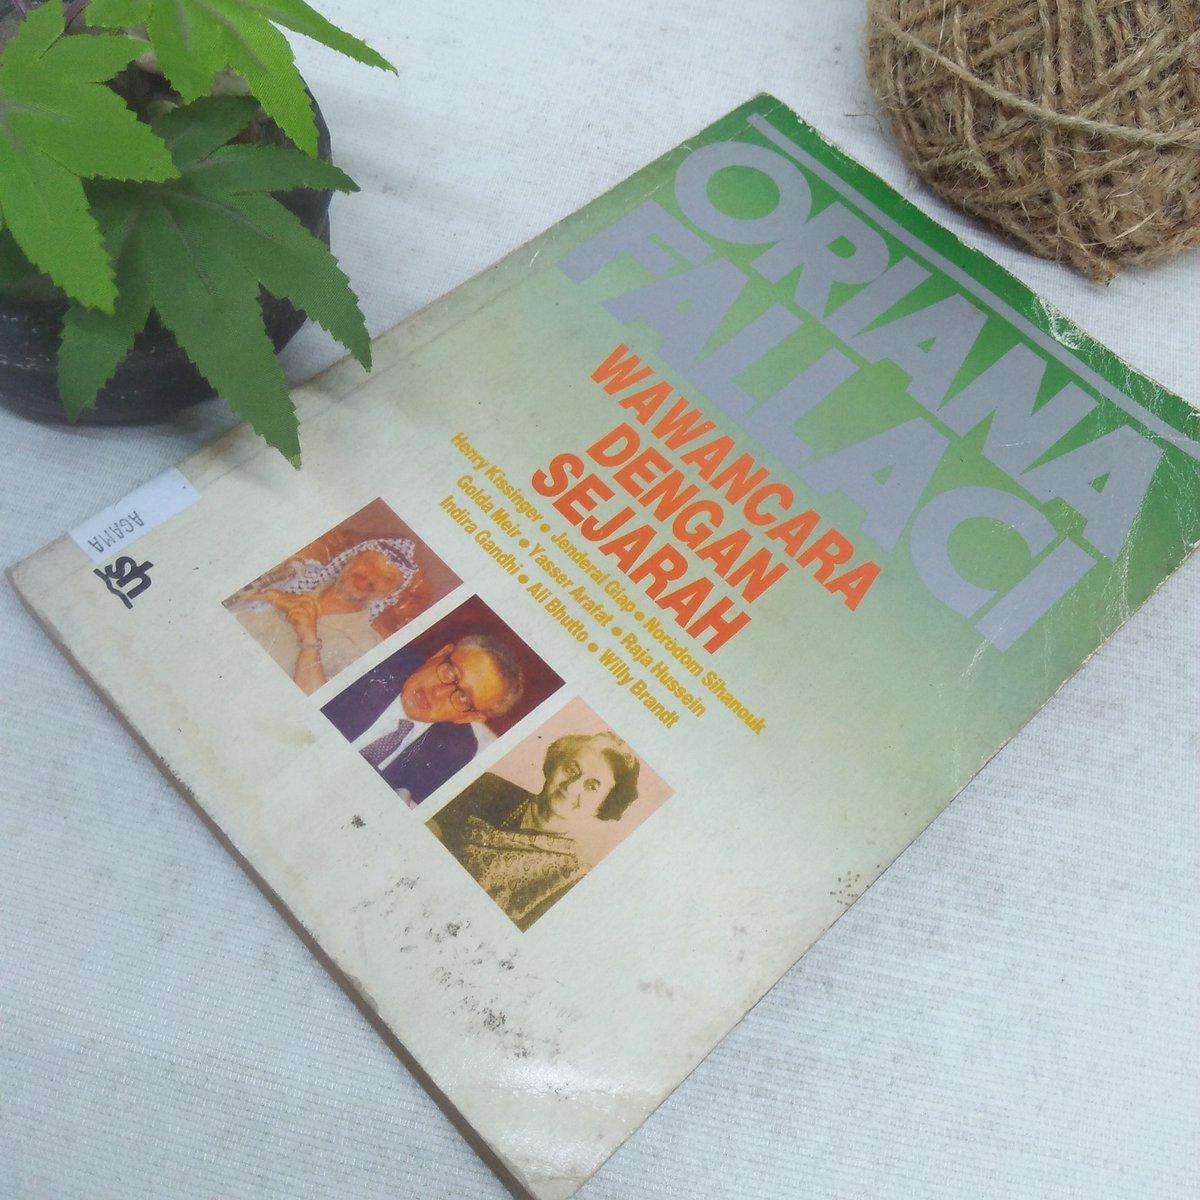 Buku Lawas > Wawancara Dengan Sejarah   Oleh; Oriana Fallaci   Tahun 1988 286 Halaman   Harga 75.000 Minat?    Order: ✓DM or Klik WA https://t.co/xMnymNzYyW https://t.co/I6swrfXDqj